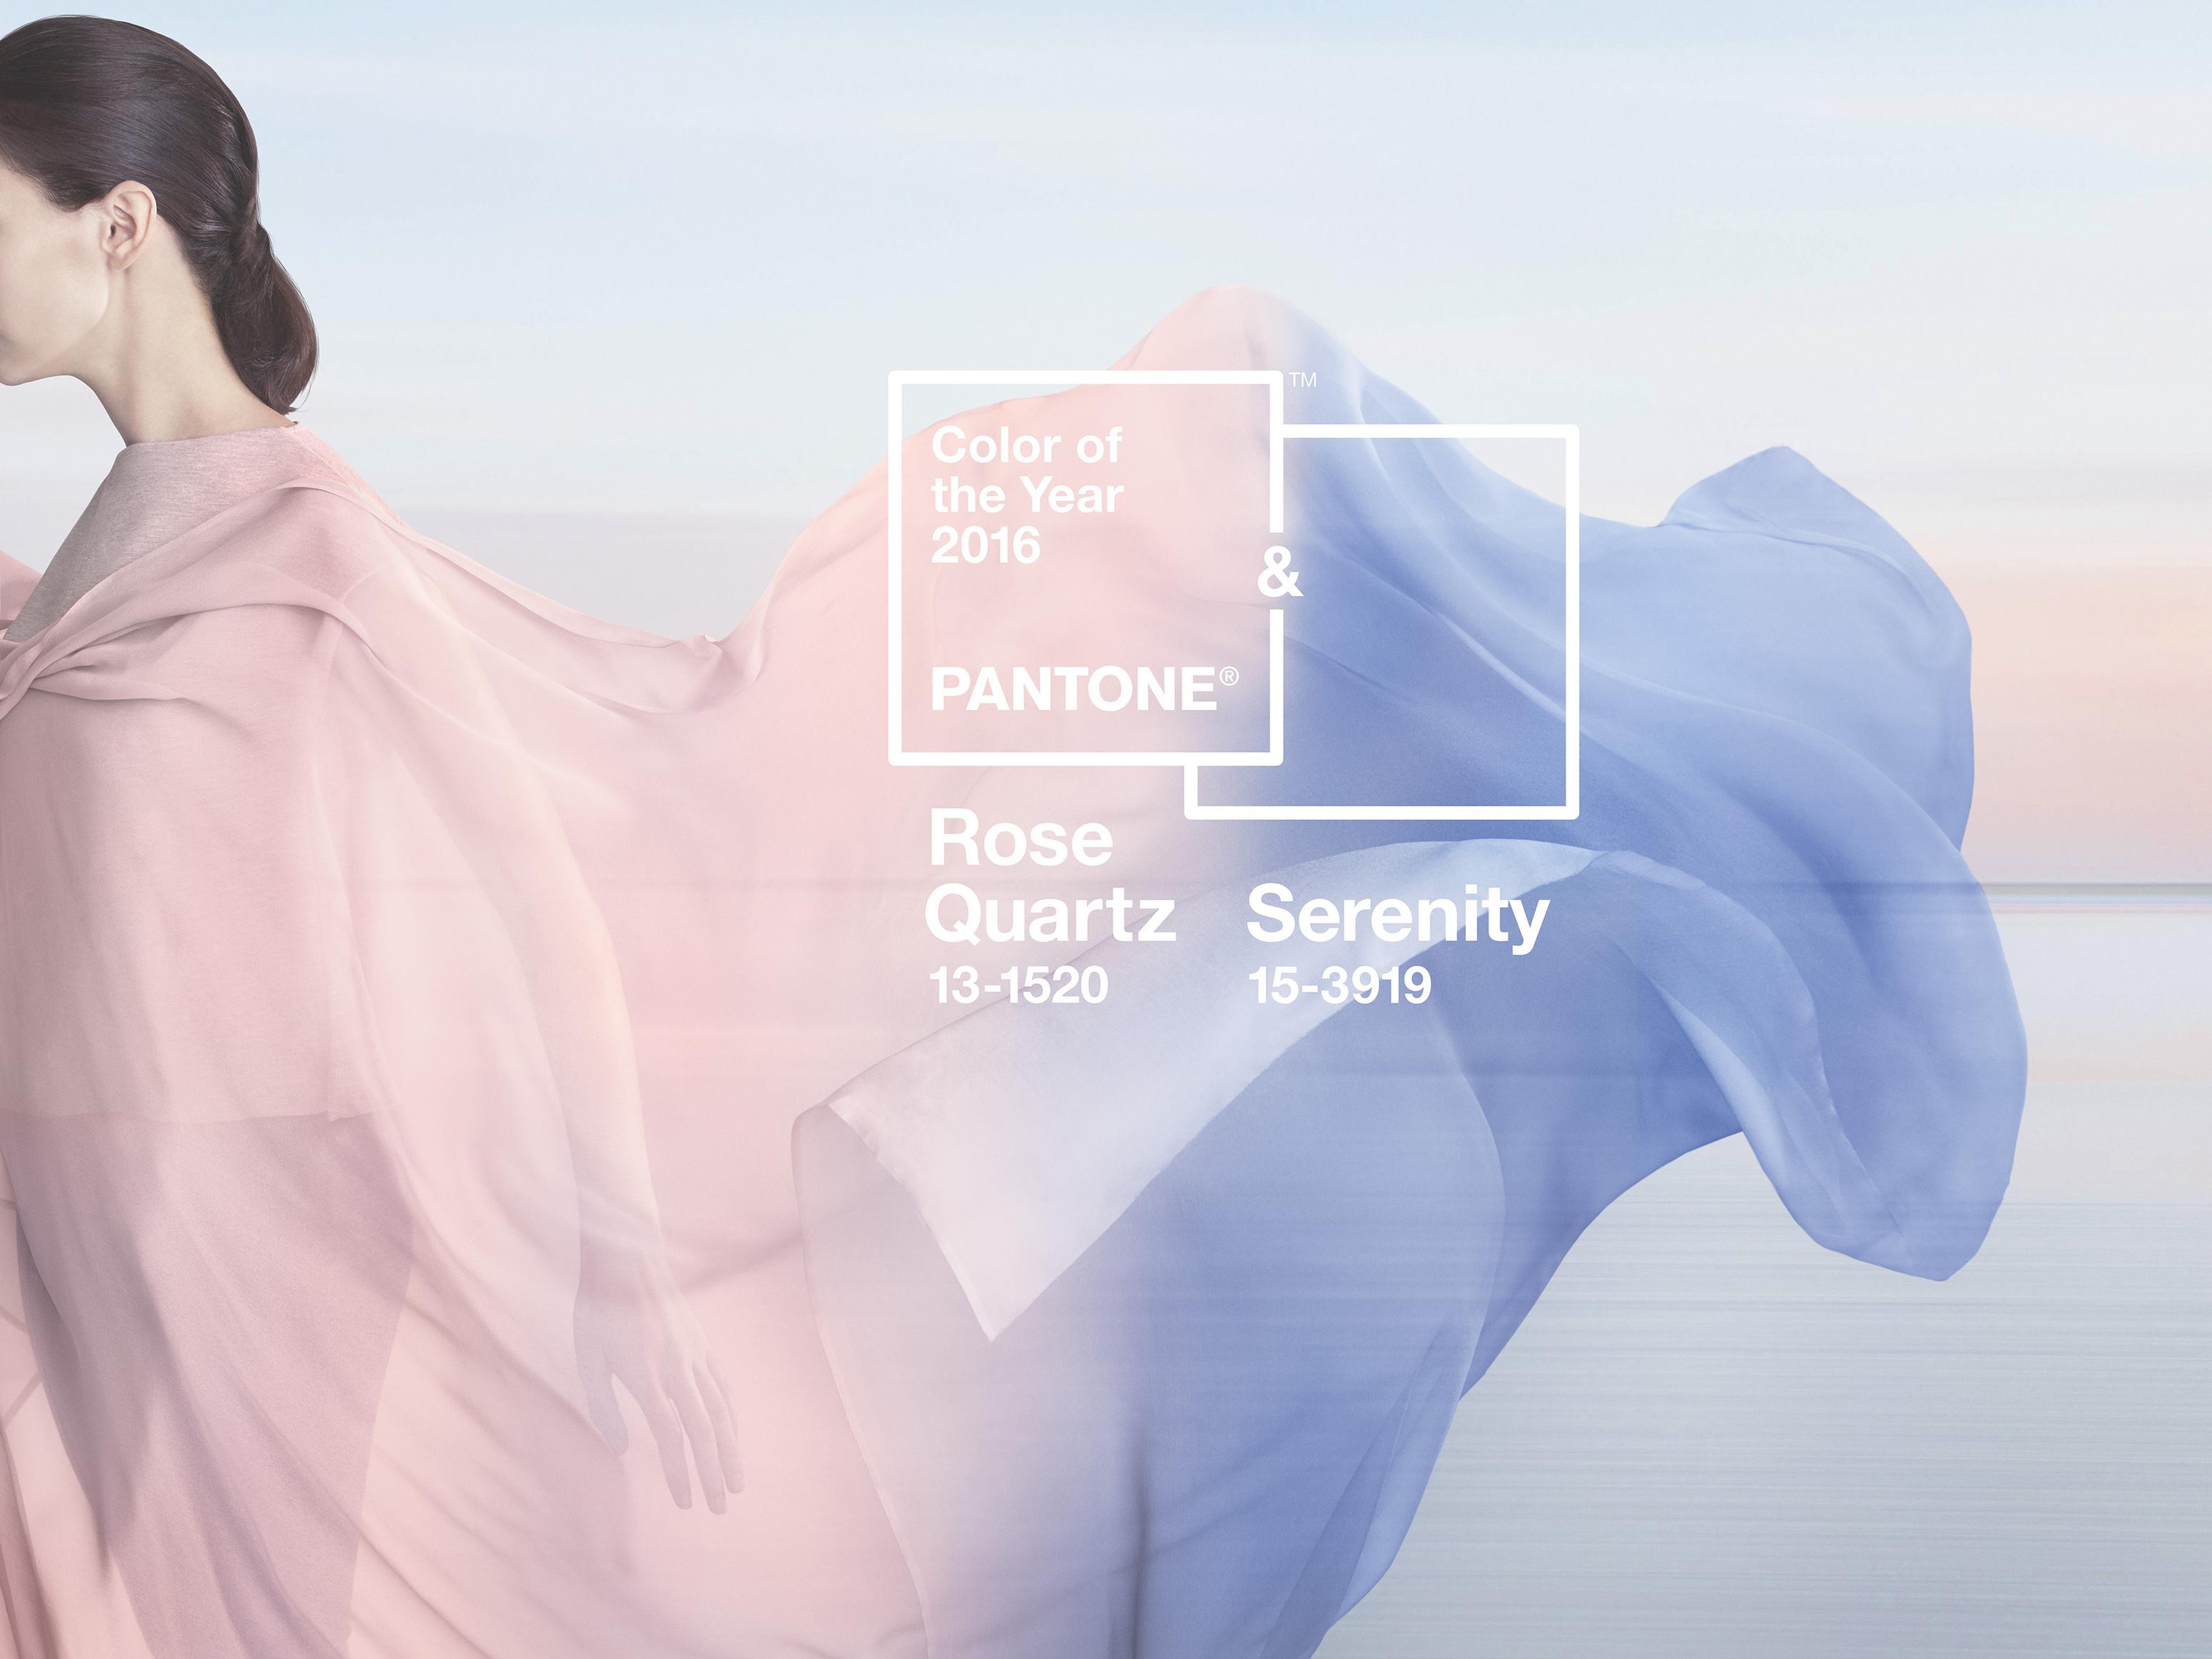 fpt12.03-pantone-farben-des-jahres-2016-serenity-rose-quartz